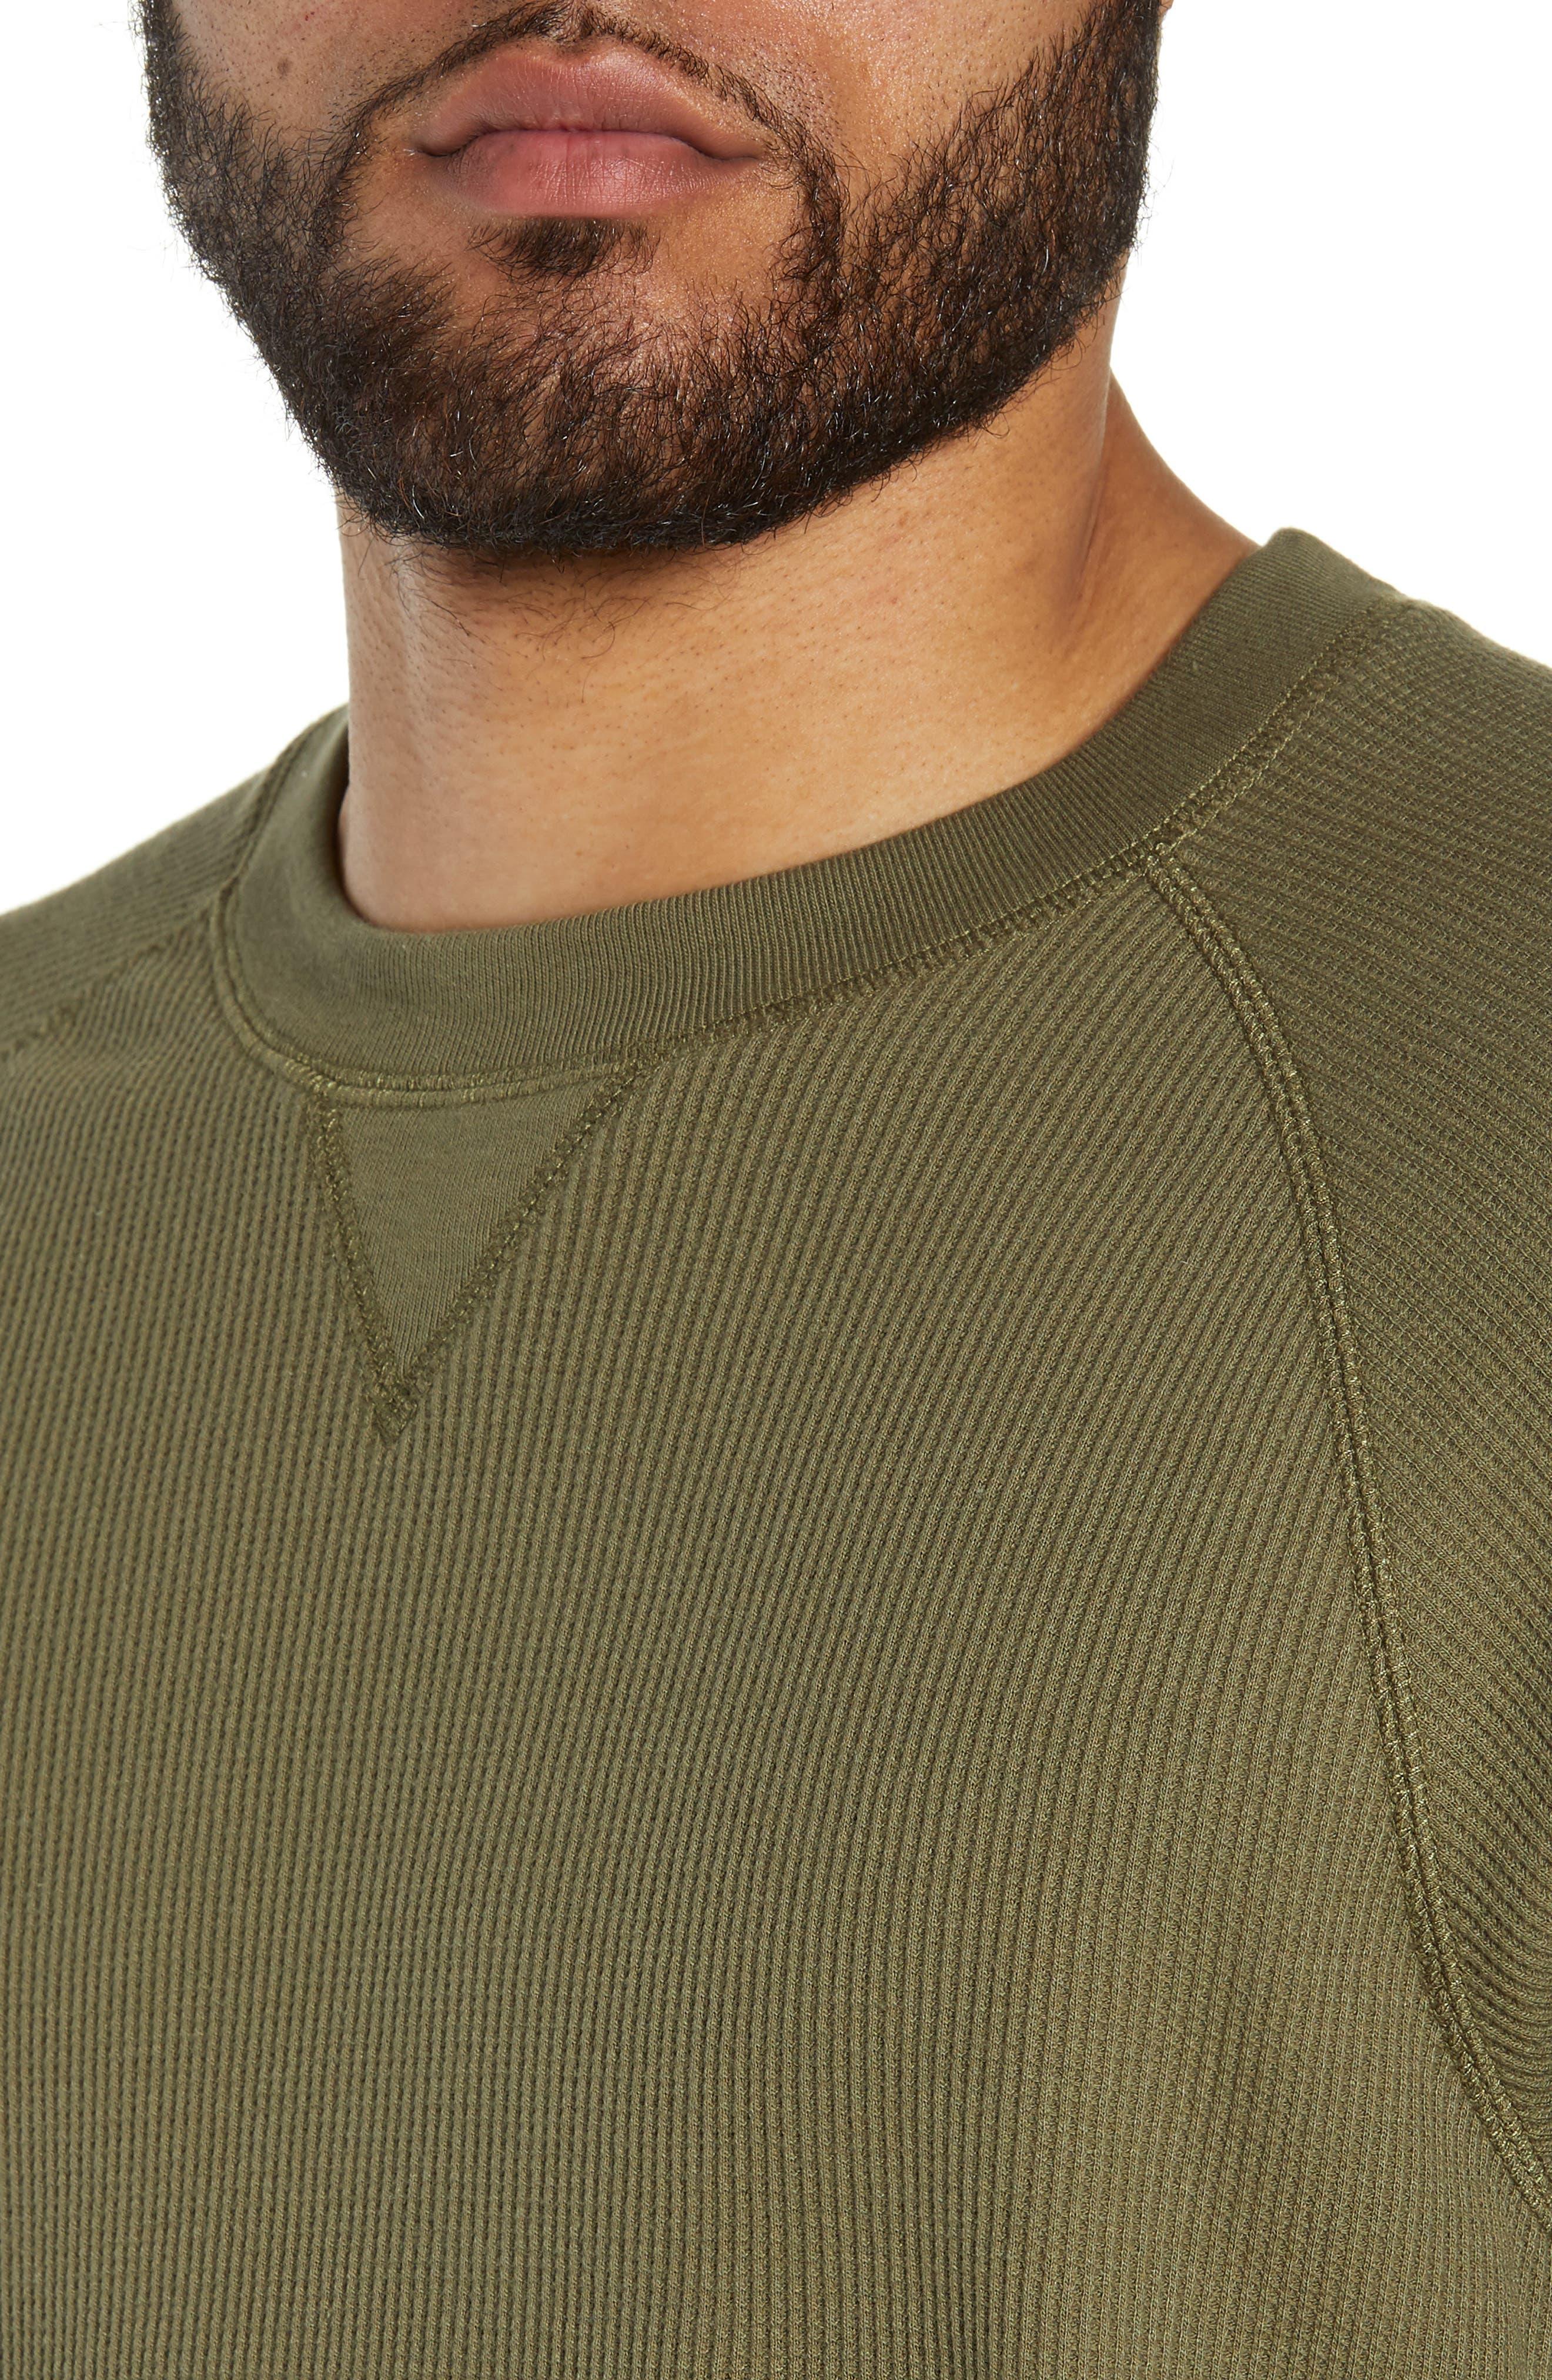 Leeward Thermal Long Sleeve T-Shirt,                             Alternate thumbnail 4, color,                             ROVER GREEN